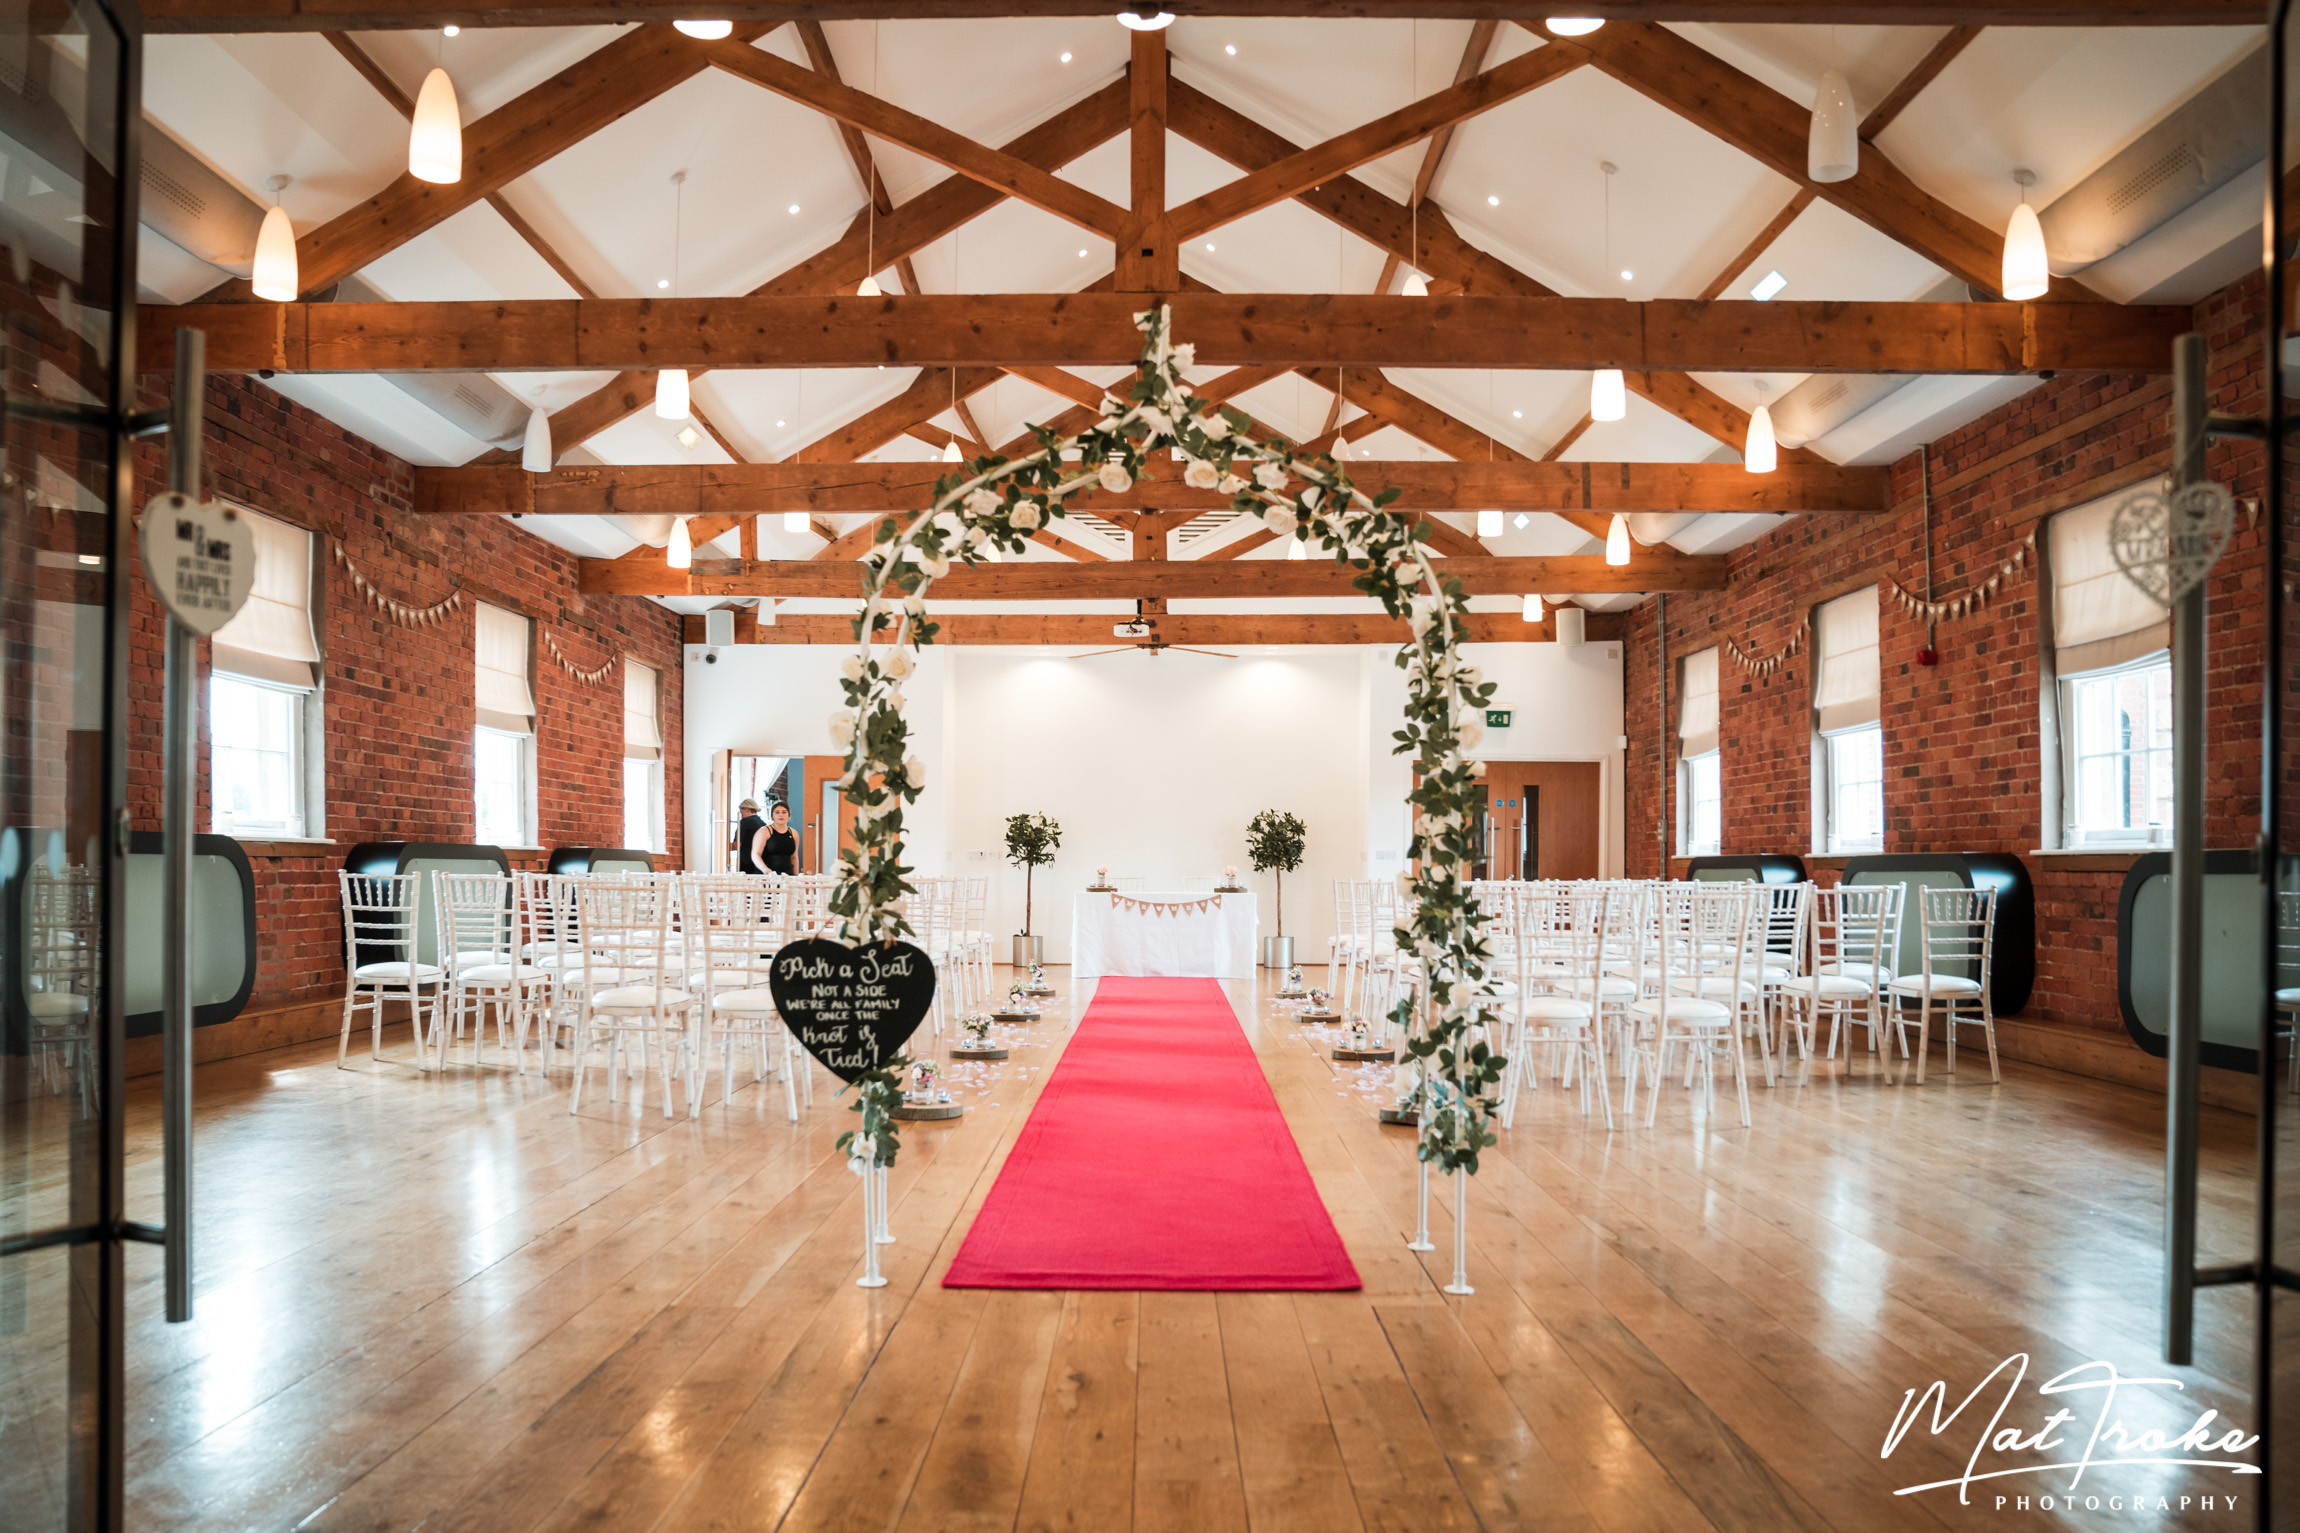 Rufford_abbey_wedding_mill_country_photographer_summer_photography_park_ruffordmill-1.jpg